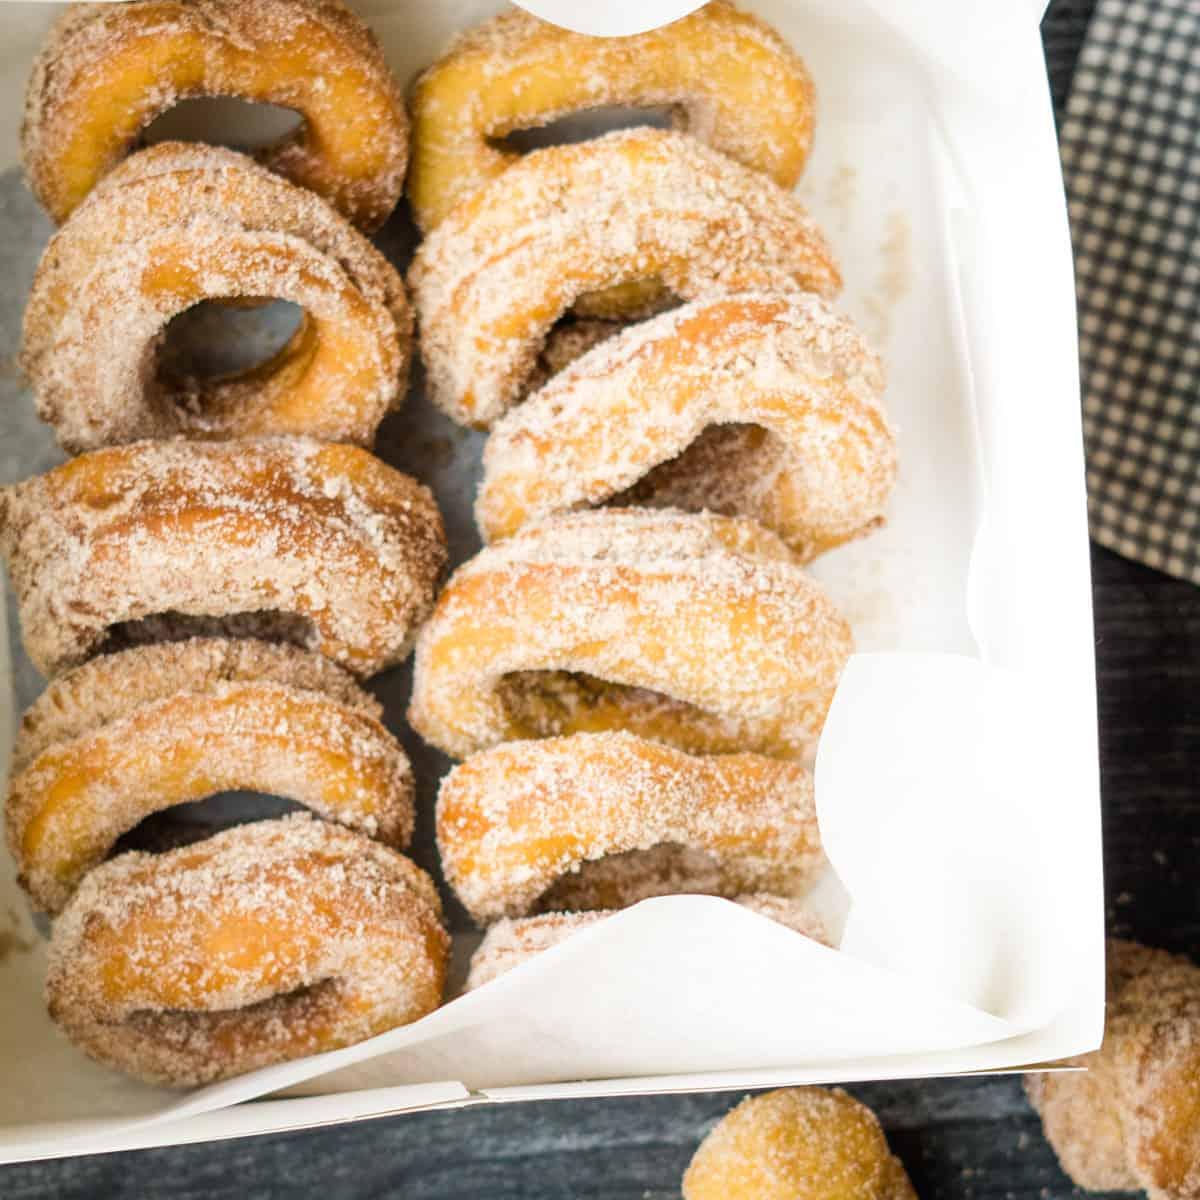 apple cider doughnuts in white cardboard box